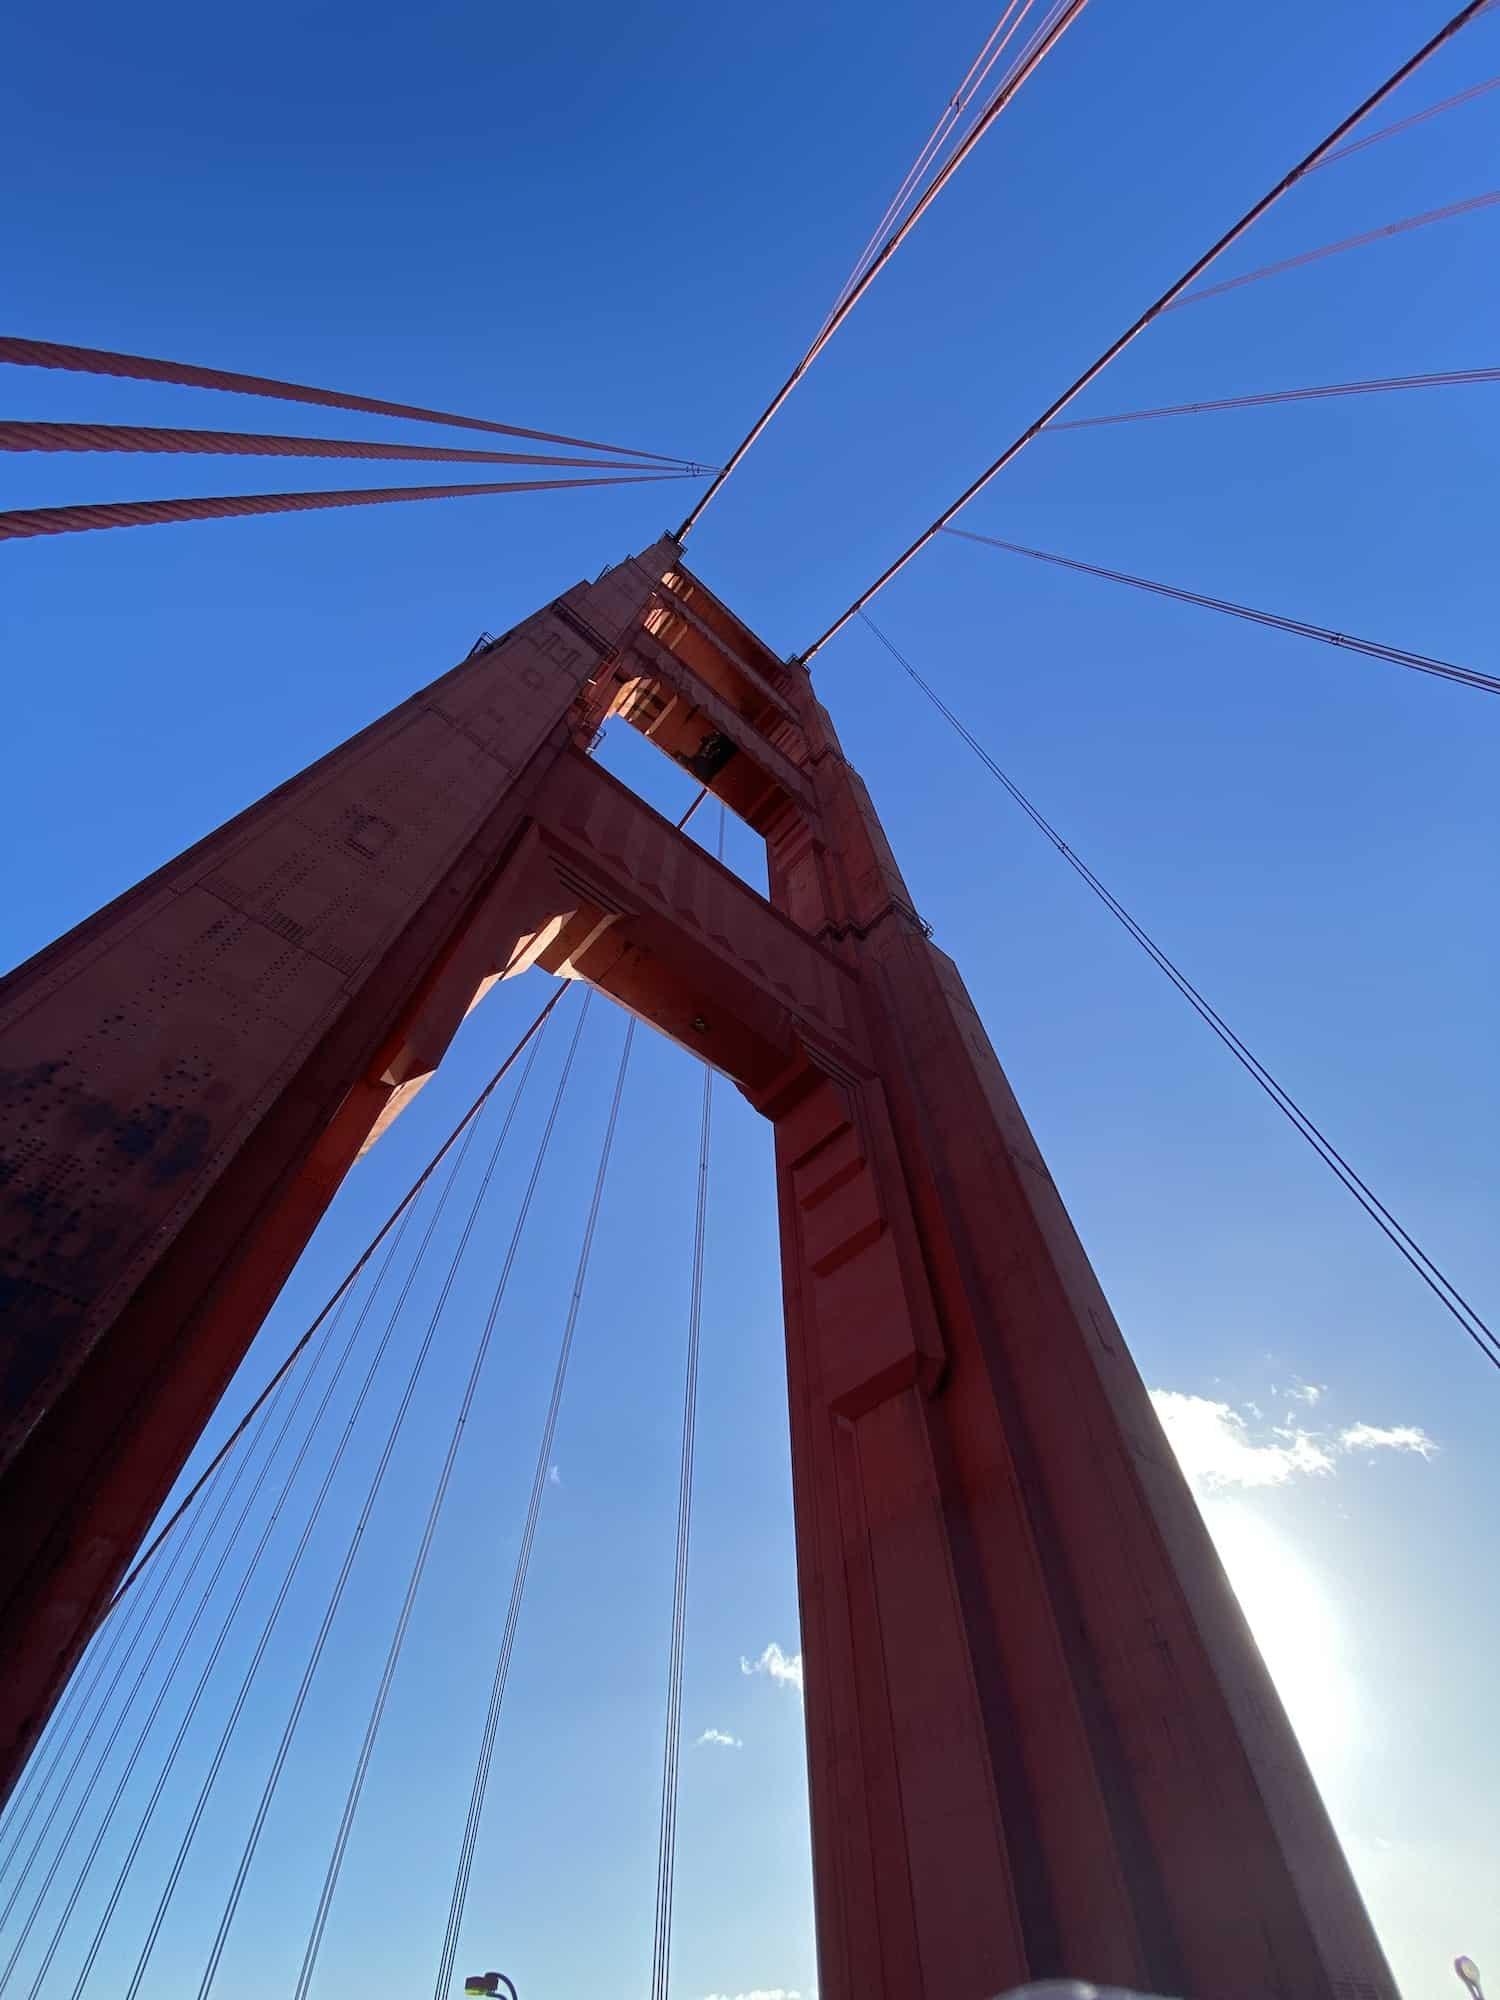 California Bucket List - Walk Across Golden Gate Bridge